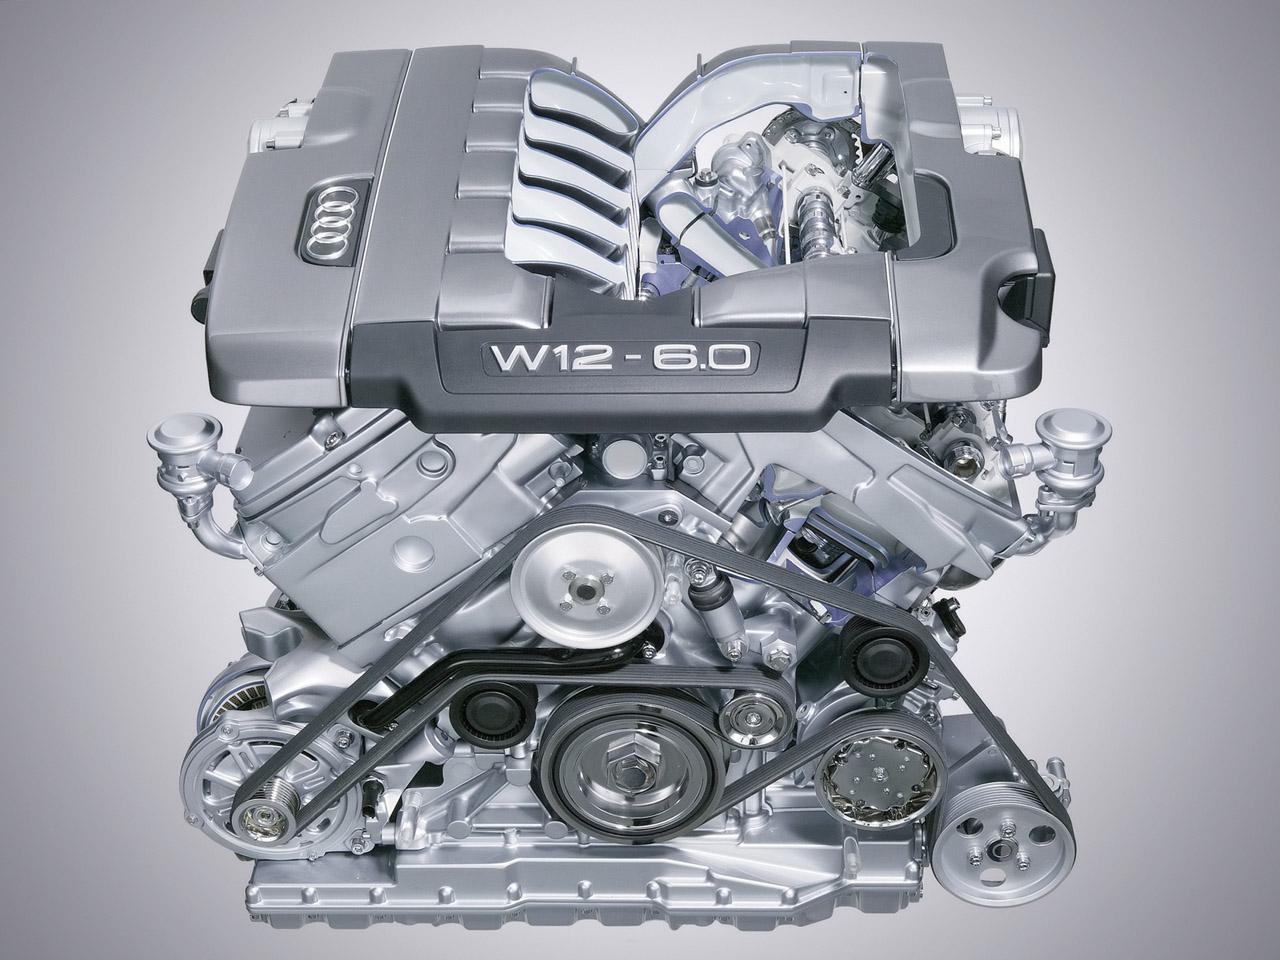 audi a8l engine diagram wiring diagram databasewrg 0912 bentley w16 engine diagram audi a8l engine [ 1280 x 960 Pixel ]